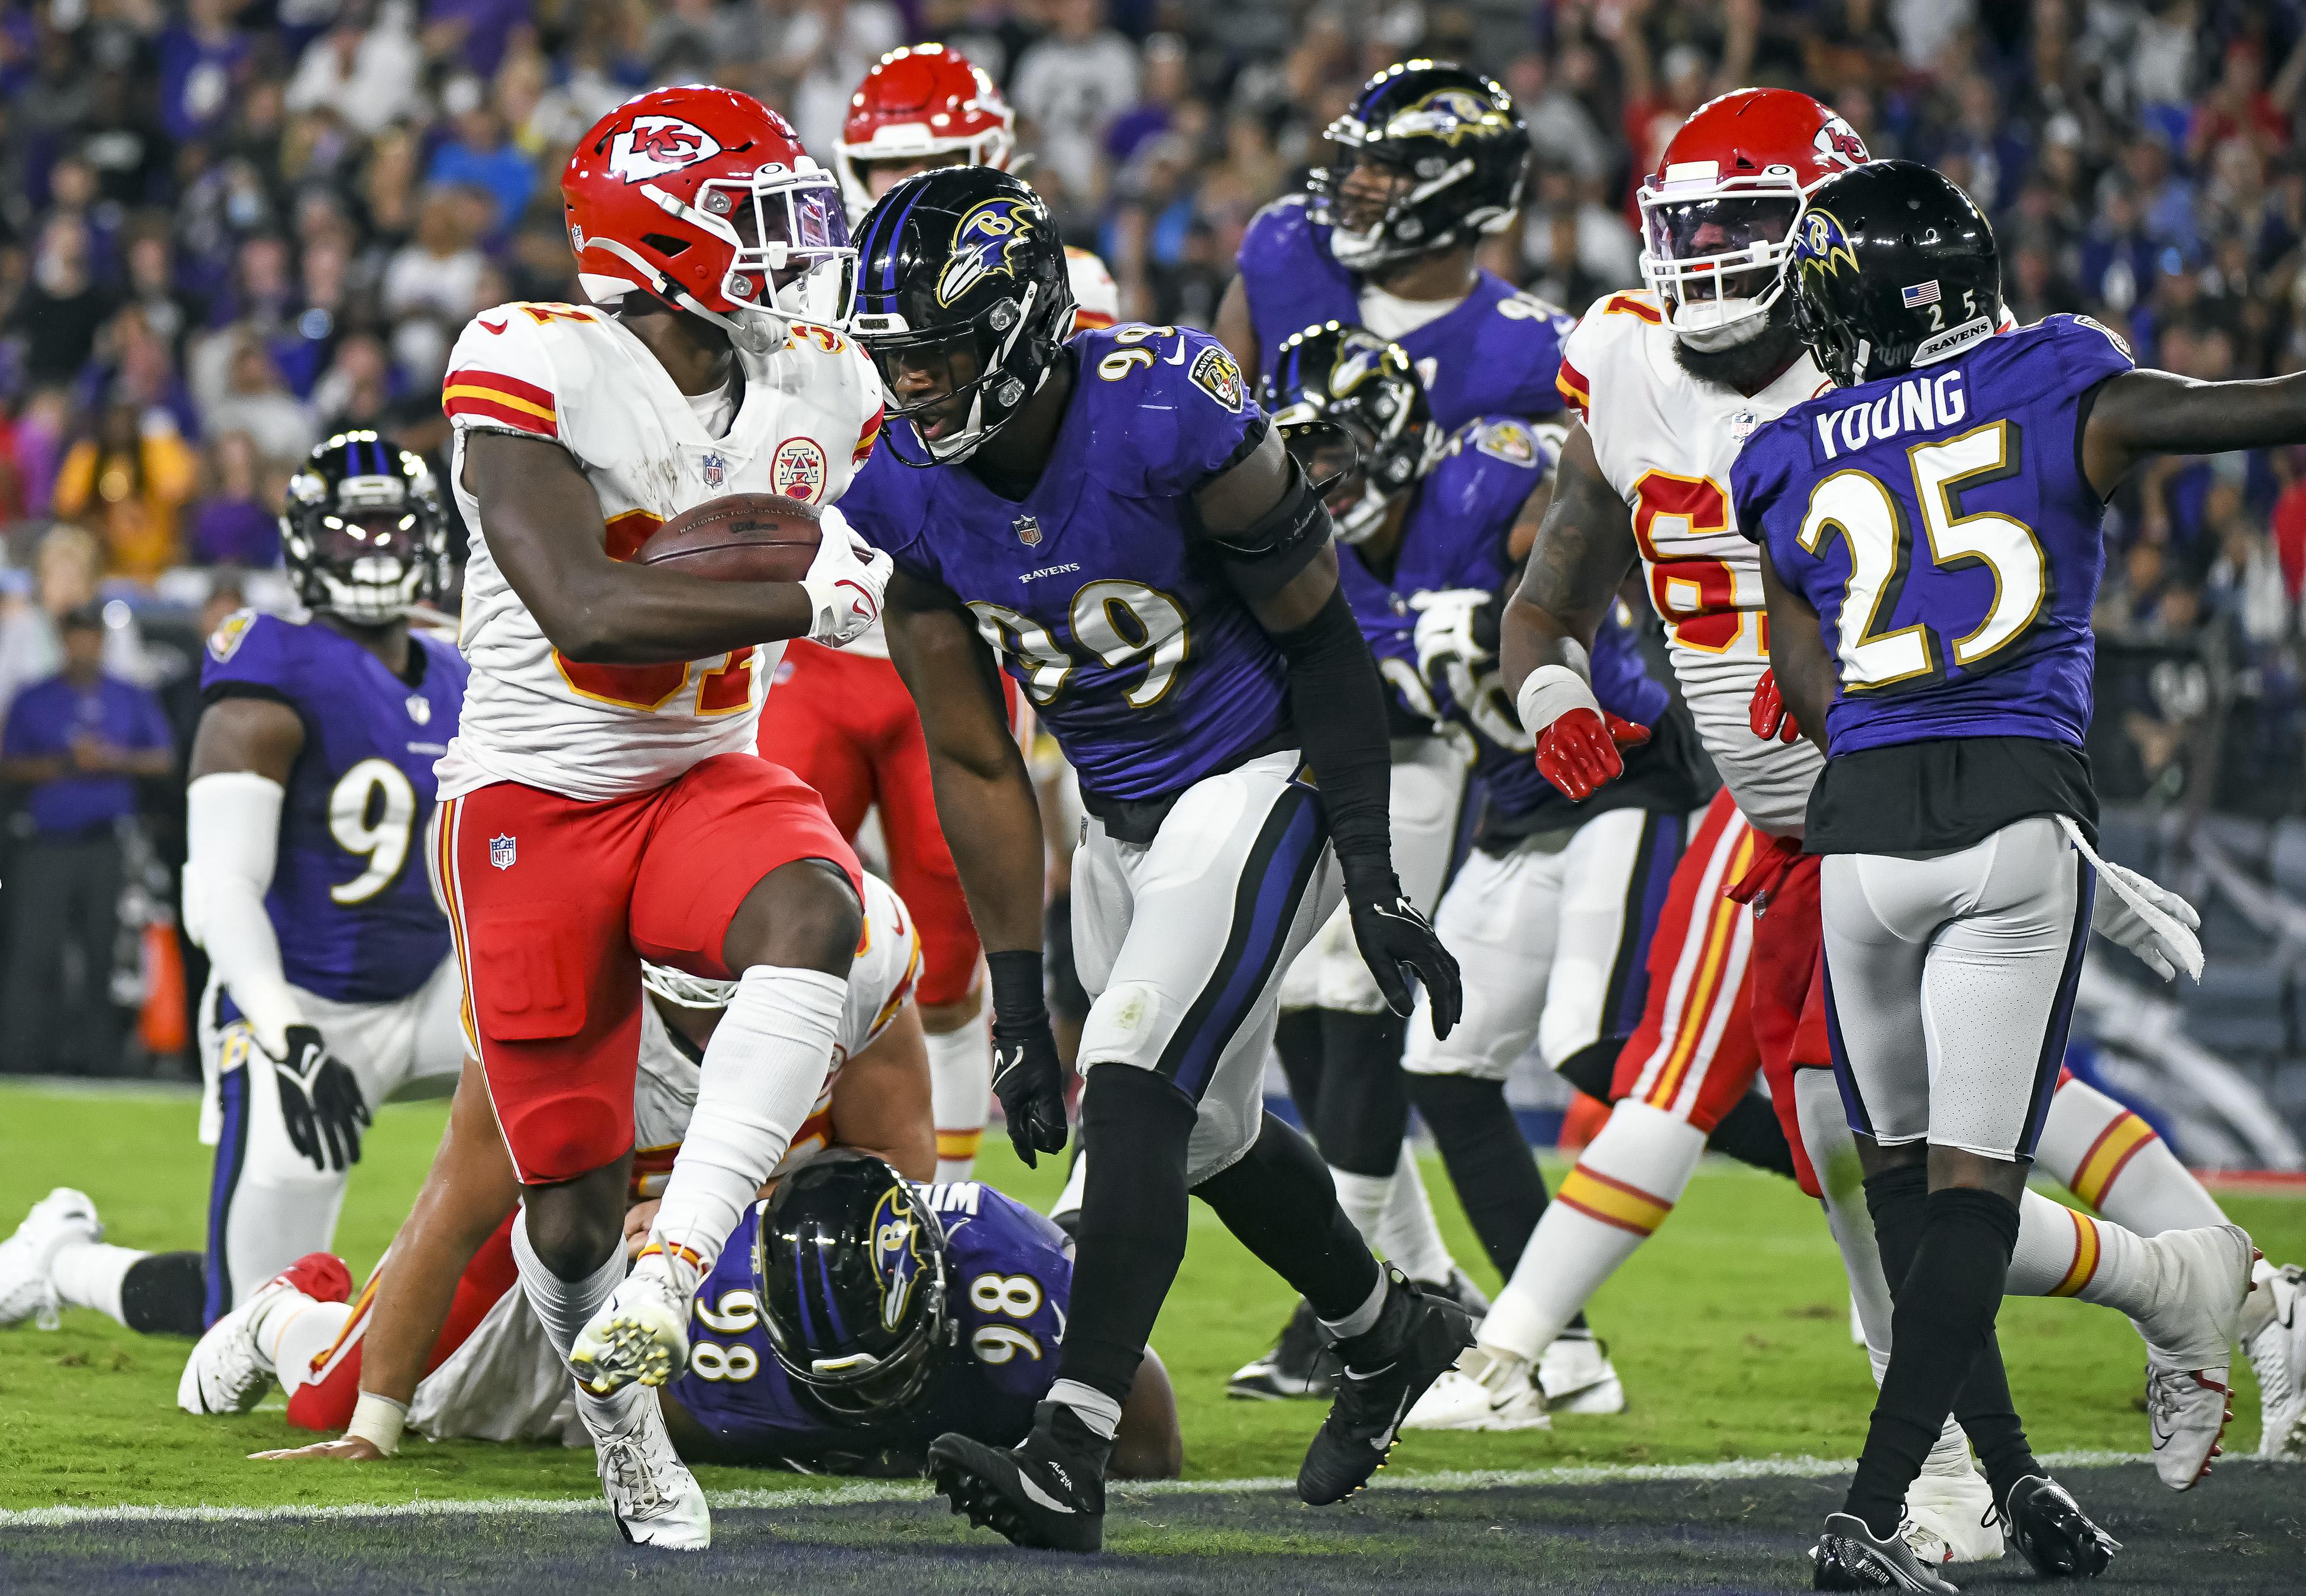 NFL: SEP 19 Chiefs at Ravens